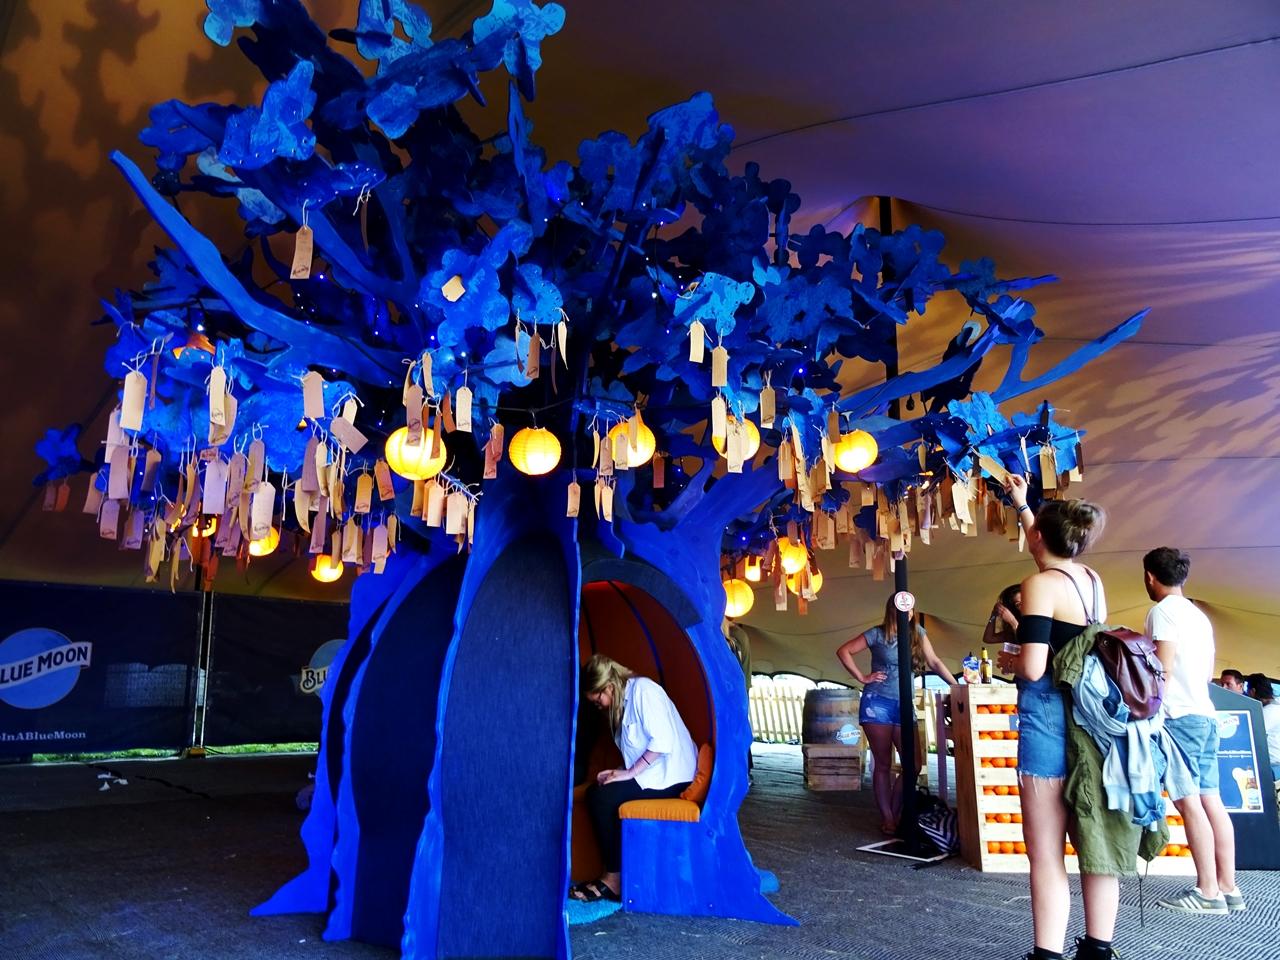 blue moon bar bluedot festival